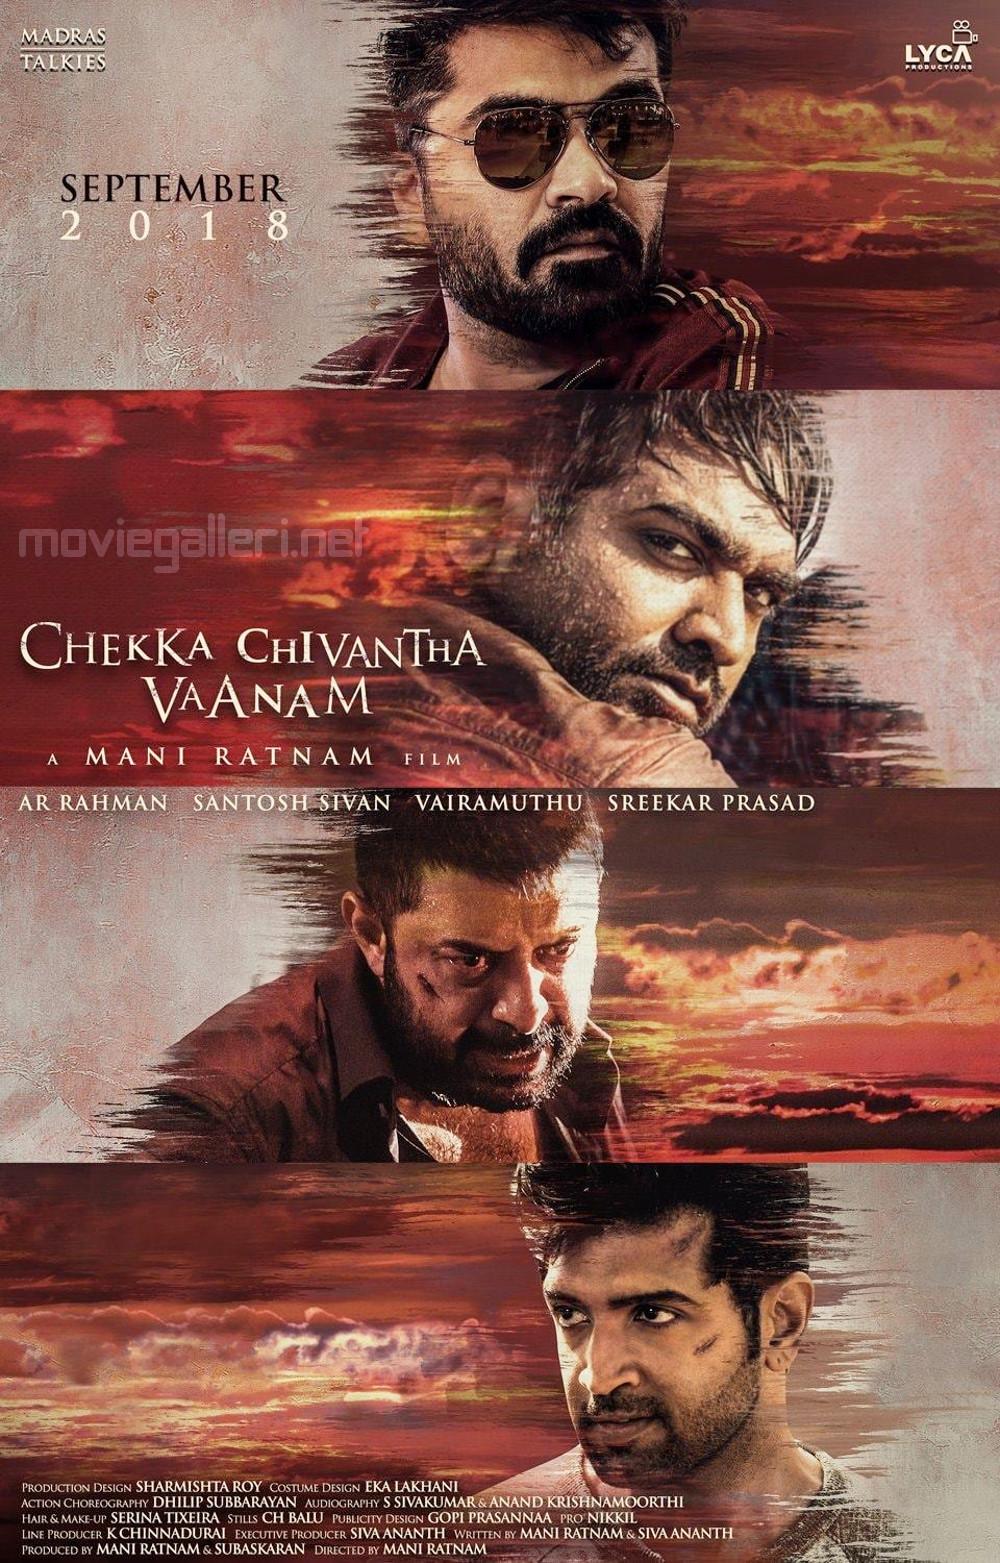 STR Vijay Sethupathi Arvind Swamy Arun Vijay Chekka Chivantha Vaanam Movie Poster HD